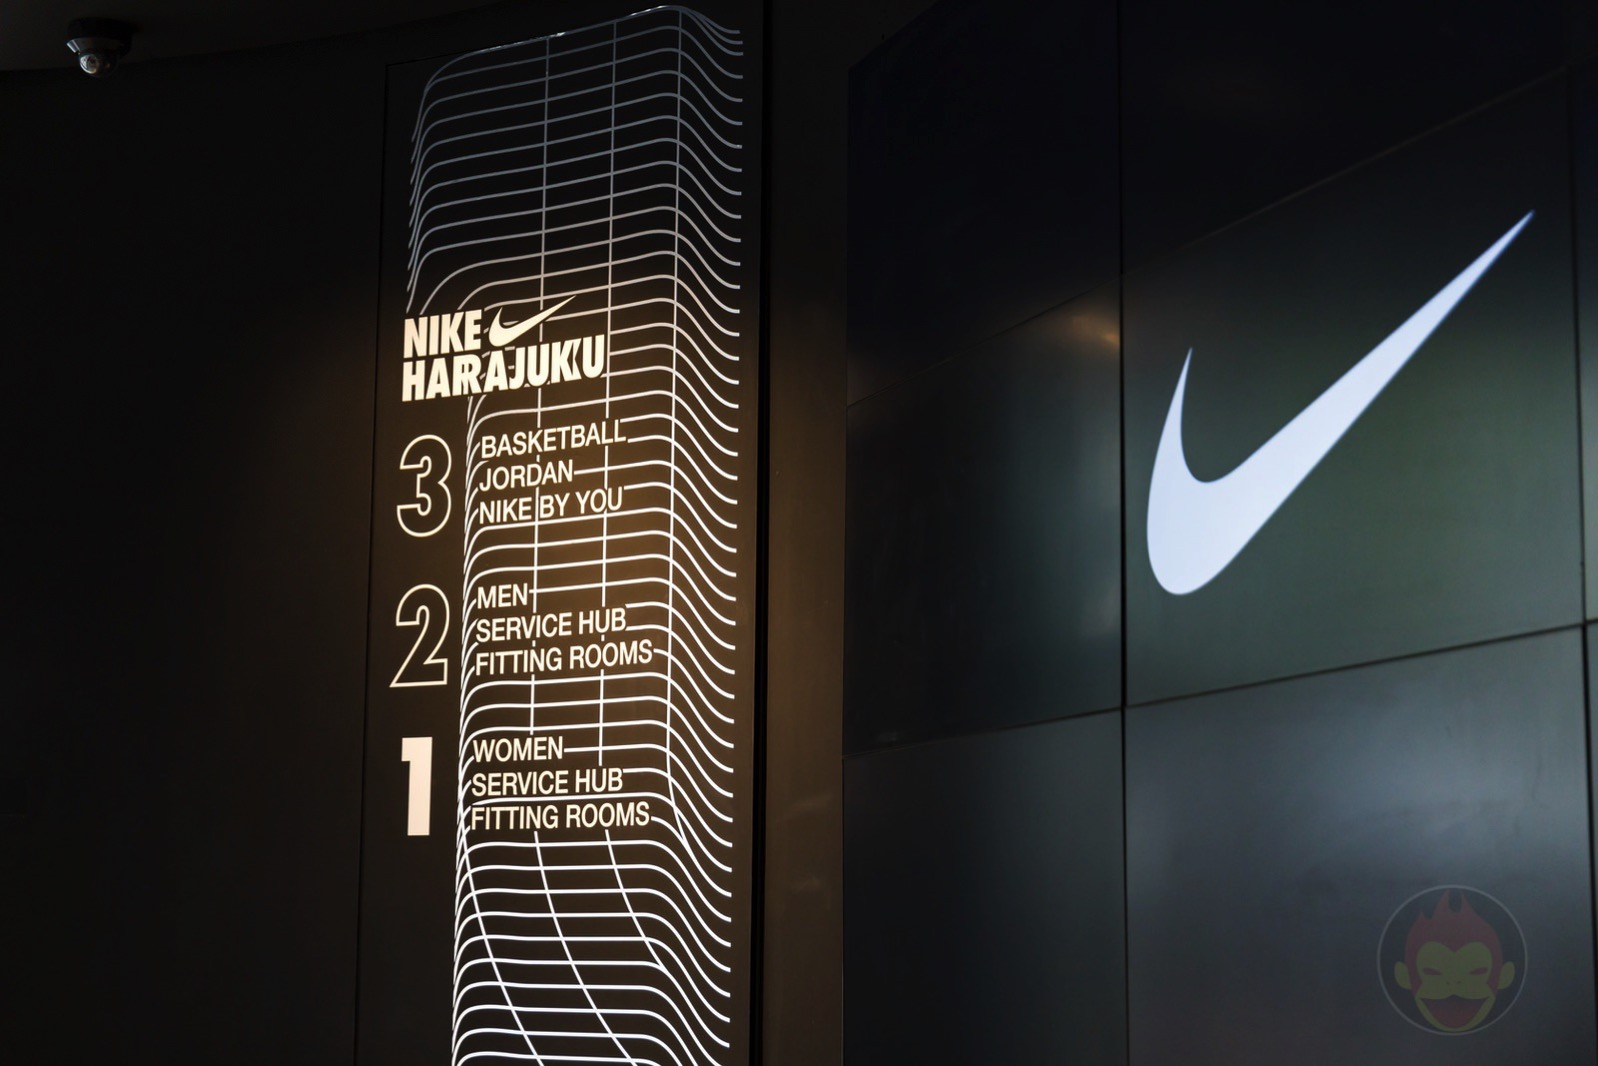 Nike-Harajuku-Renewal-07.jpg